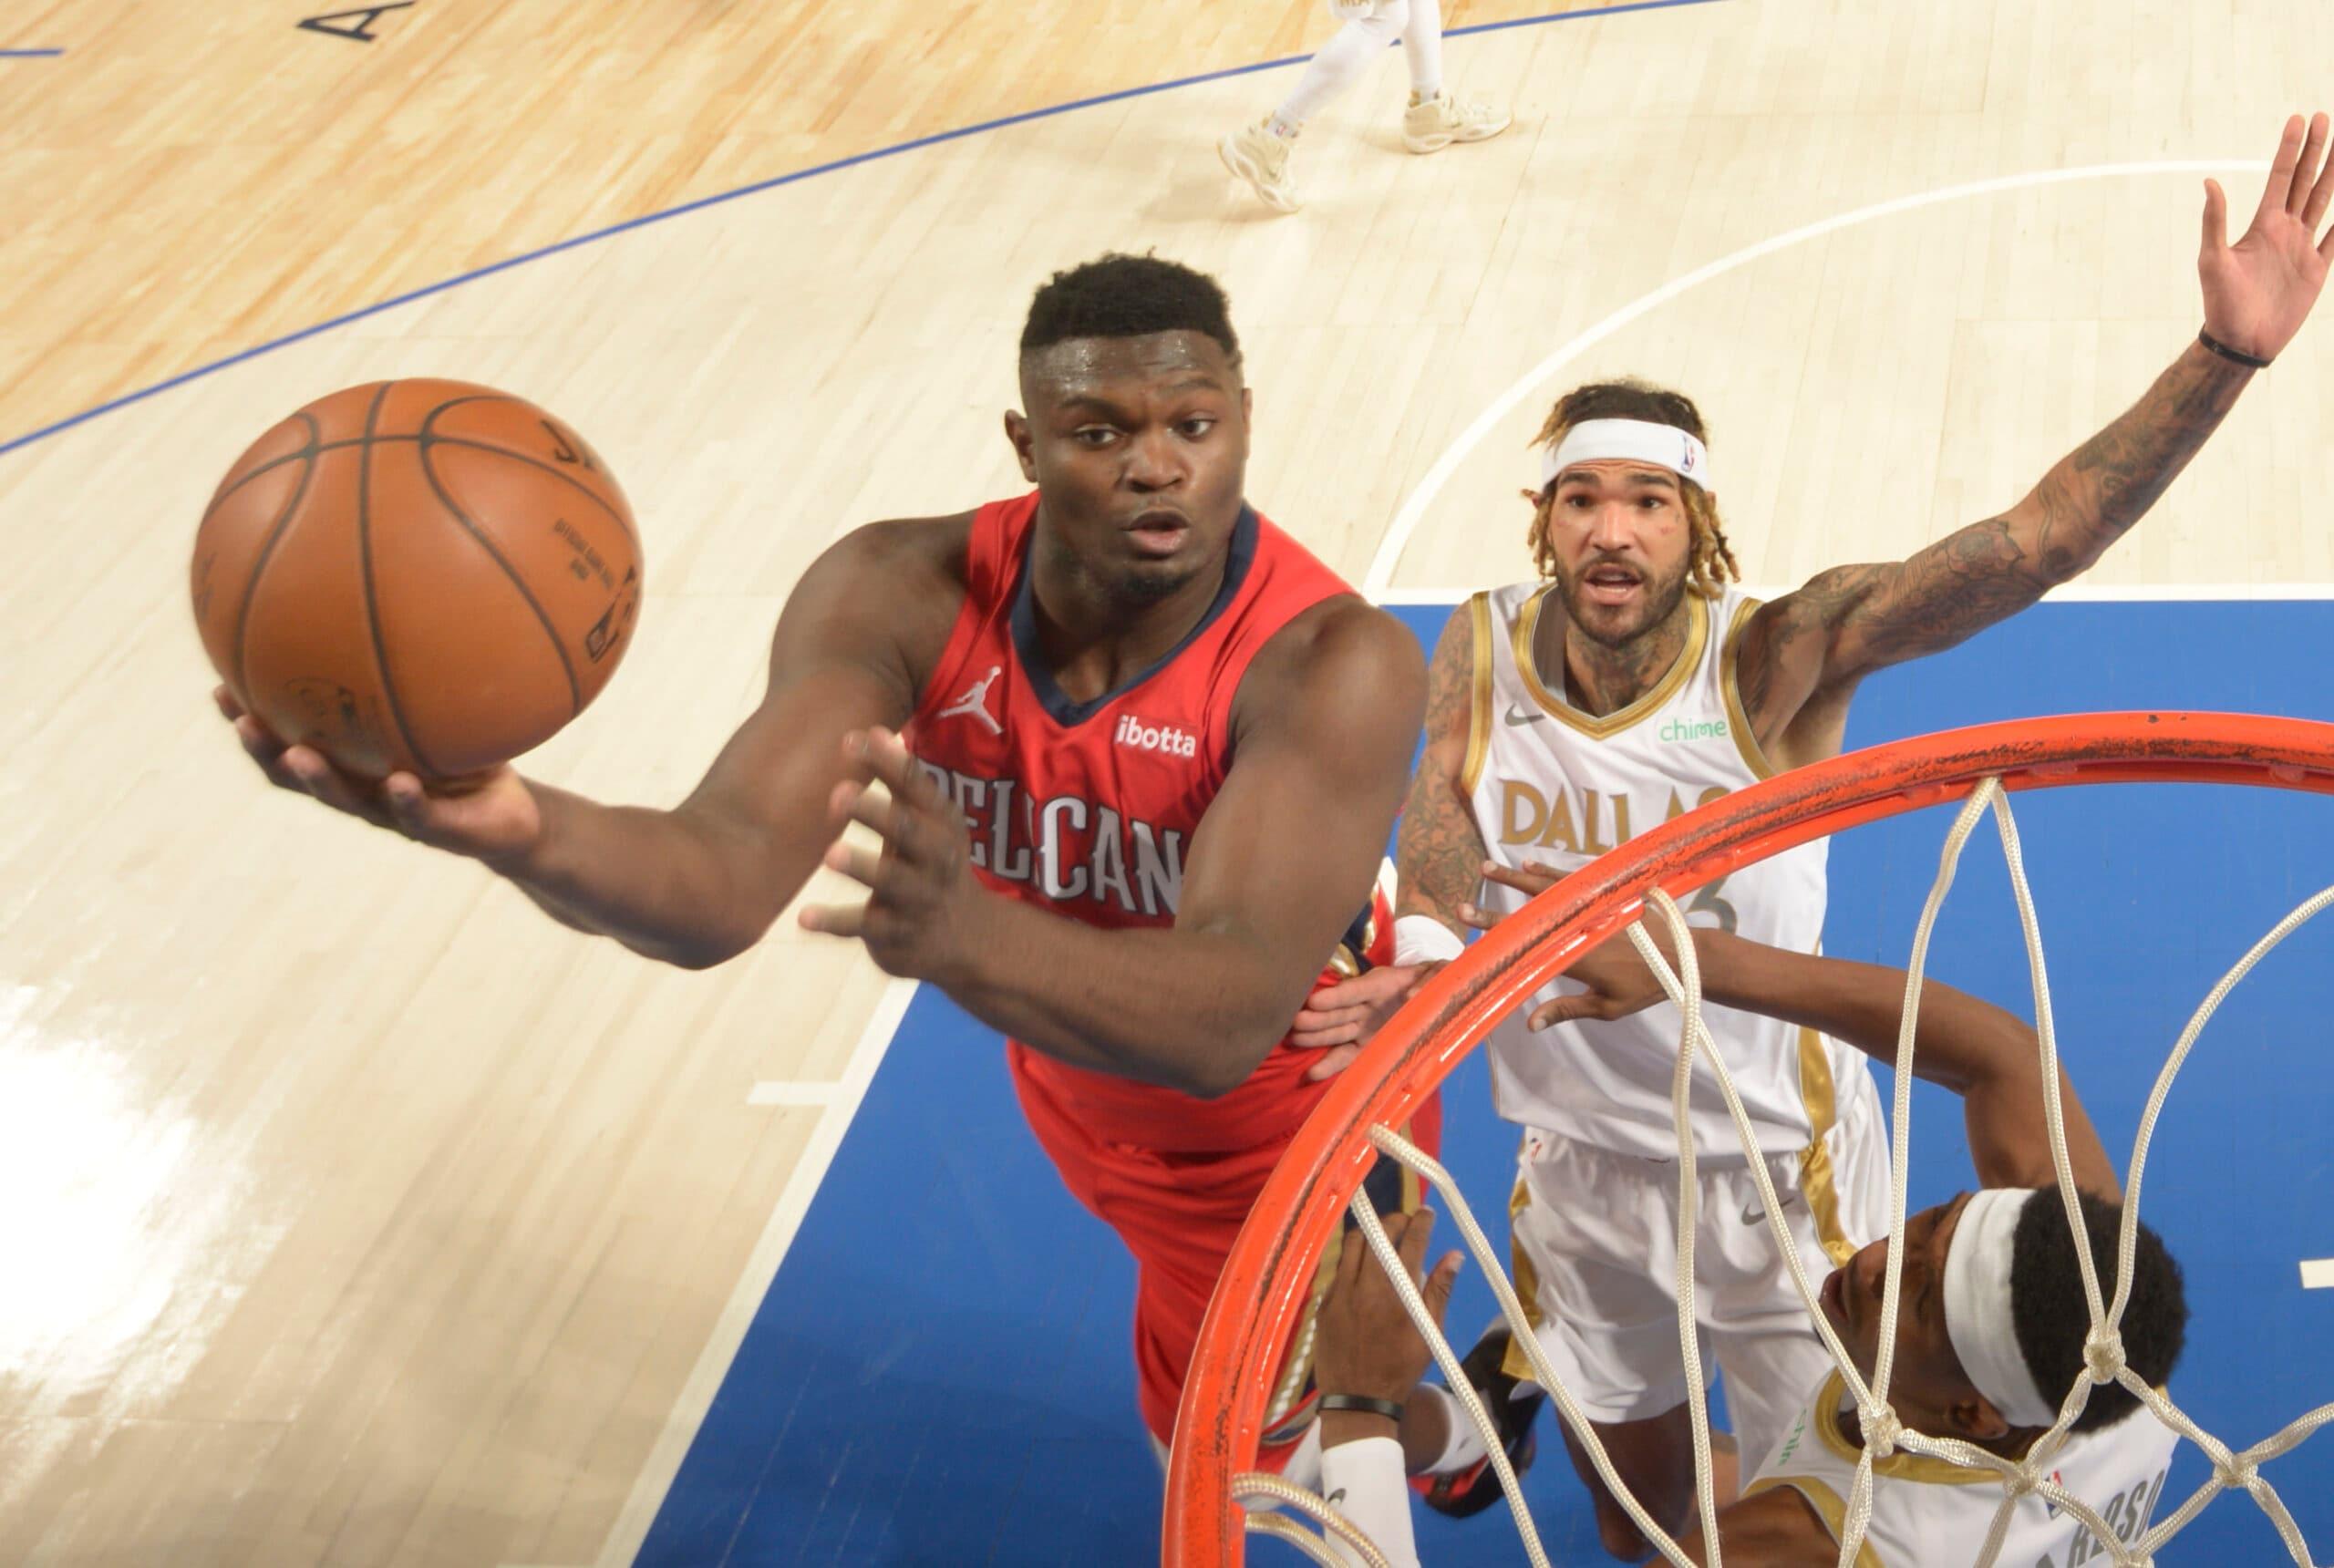 Zion Williamson (36 points) highlights vs. Dallas Mavericks